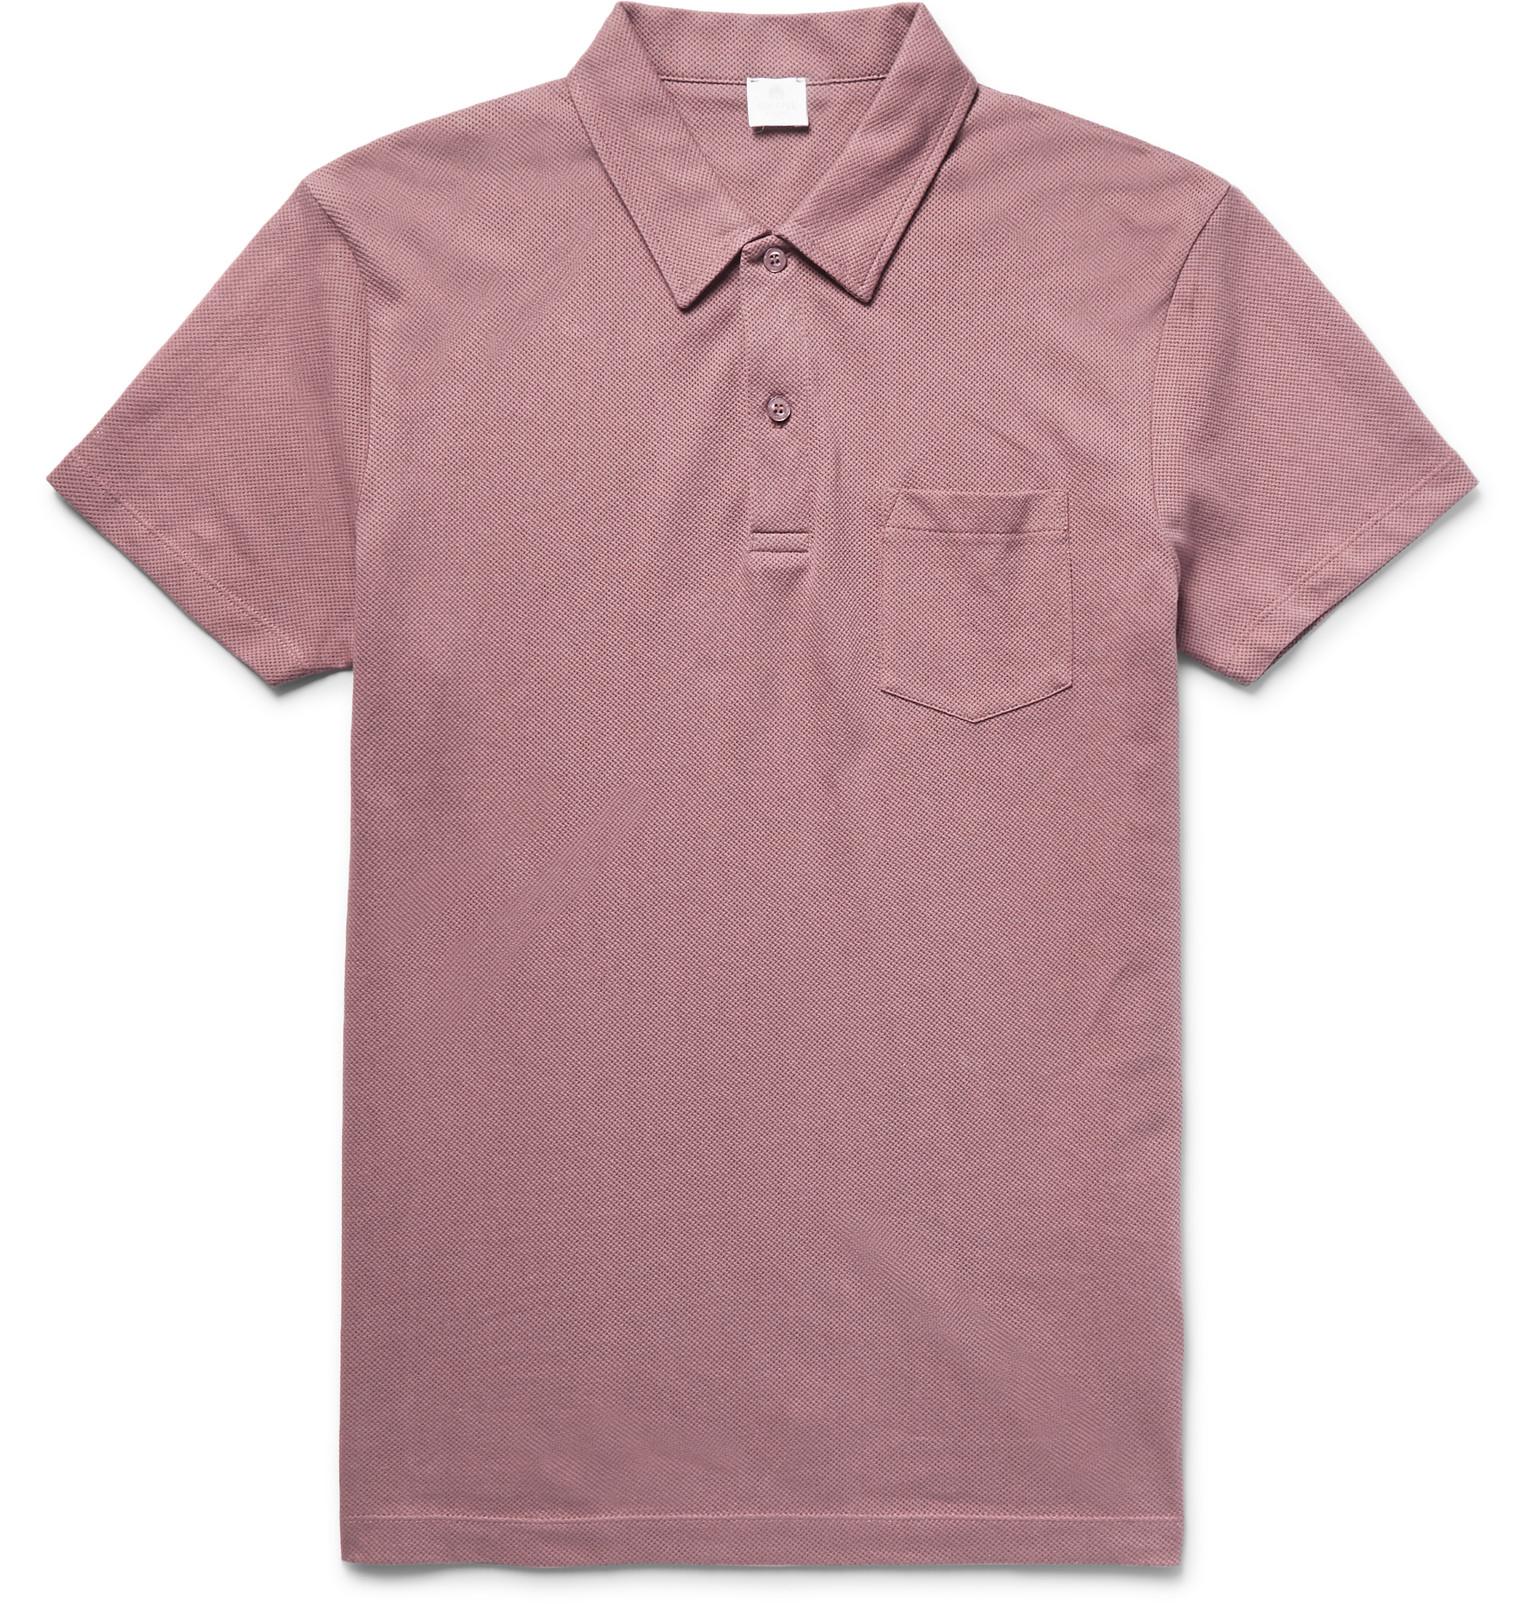 Sunspel riviera cotton mesh polo shirt for men lyst for Cotton polo shirts for men